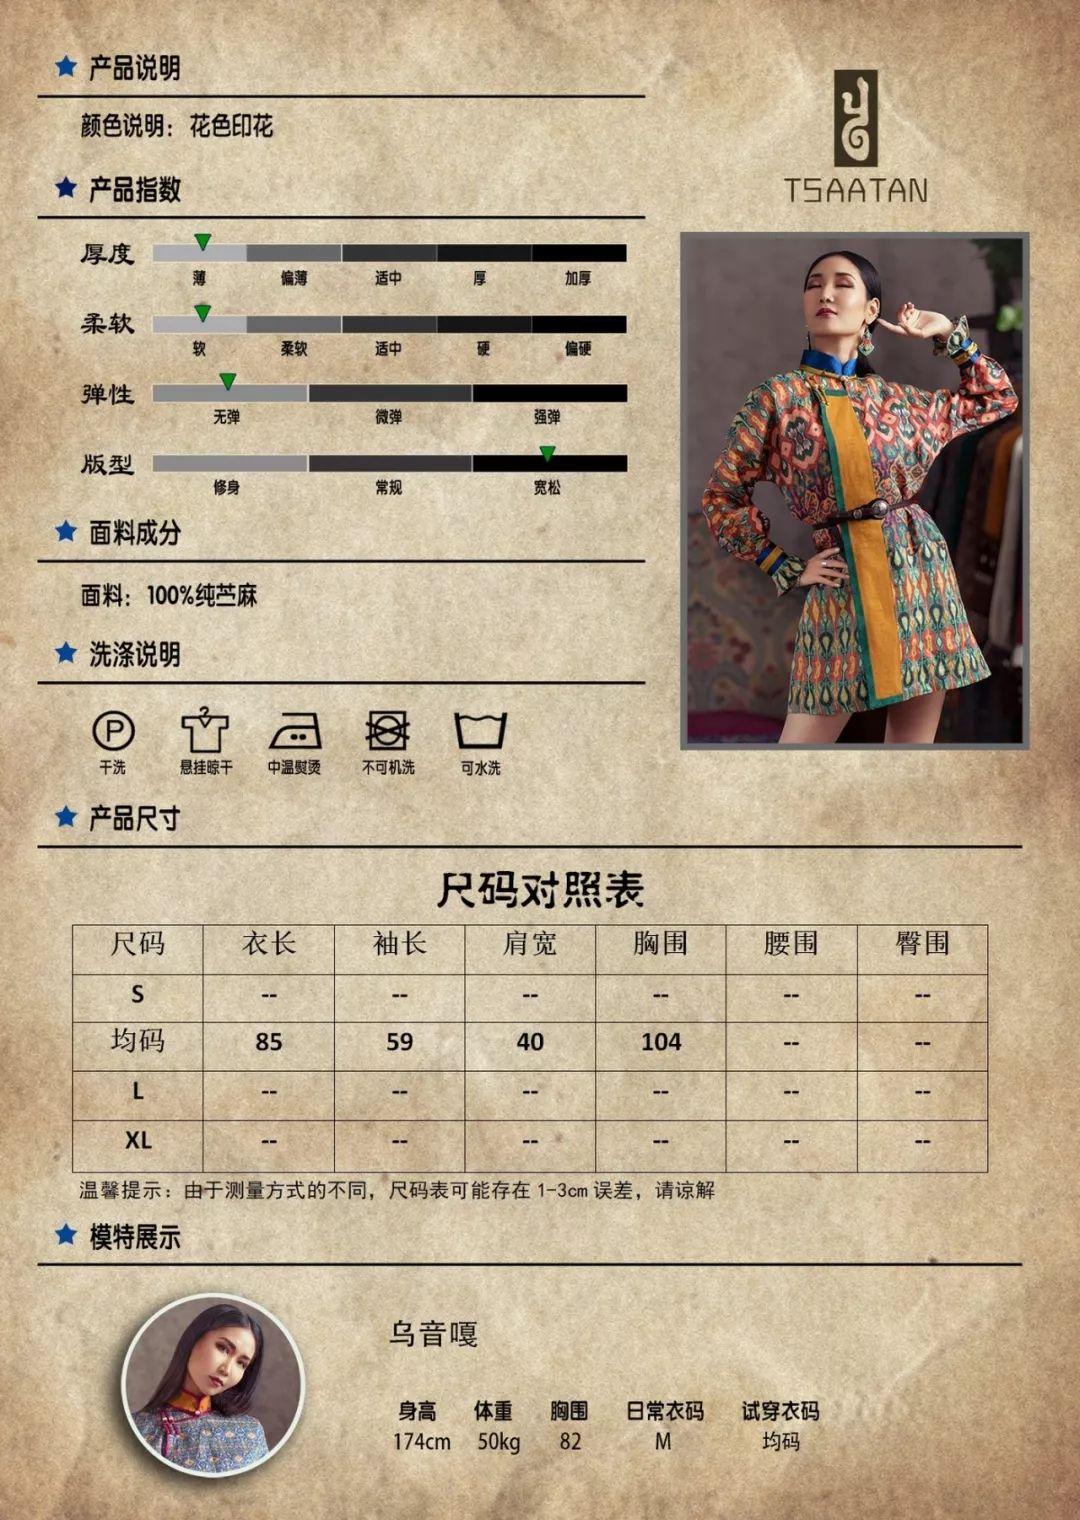 TSAATAN蒙古时装 2019夏季新款首发 第74张